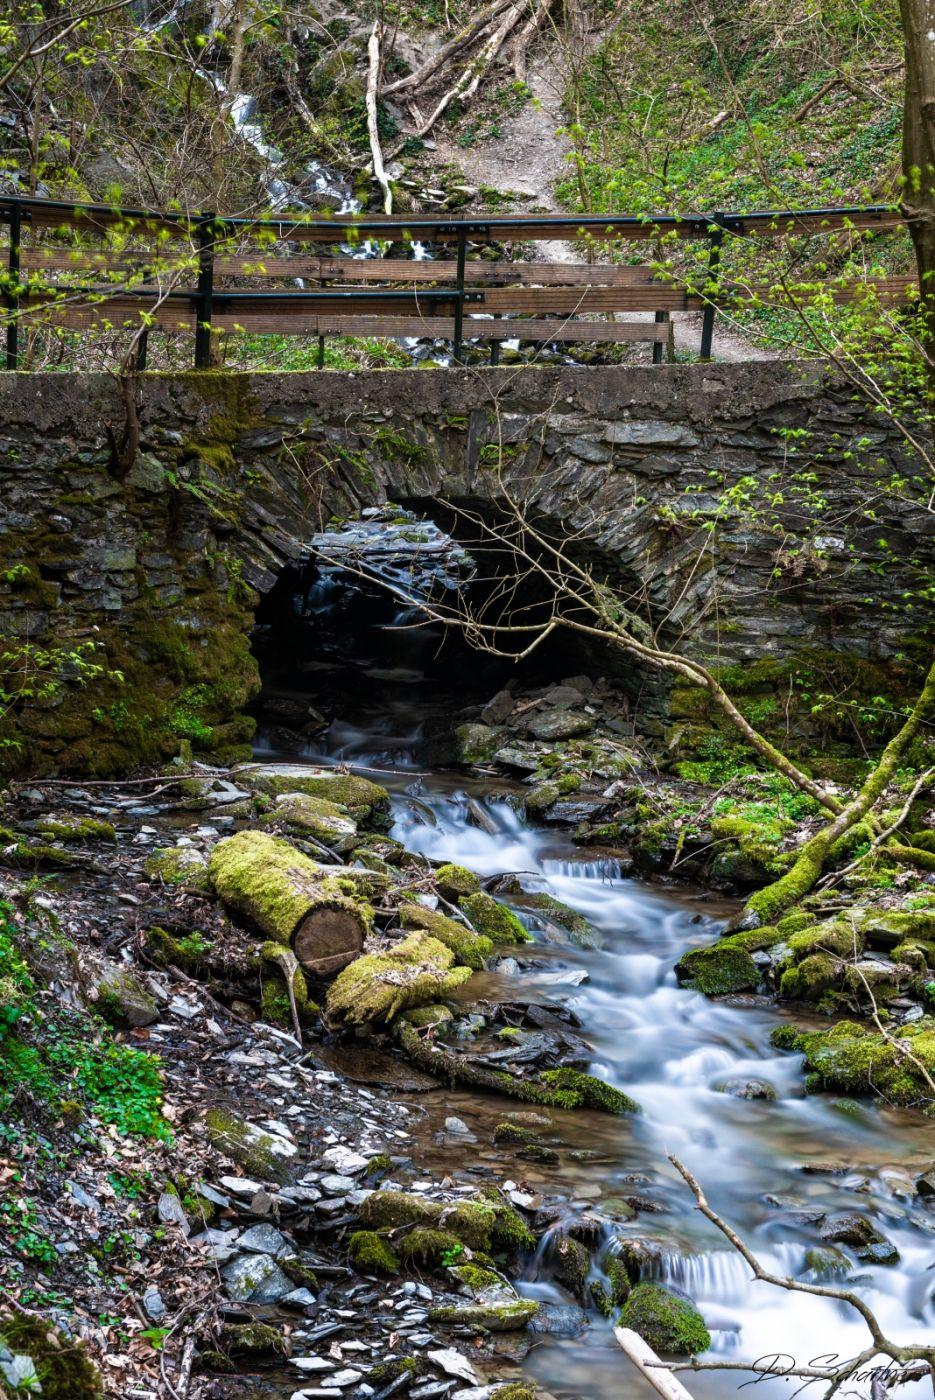 Laubach Waterfall, Germany